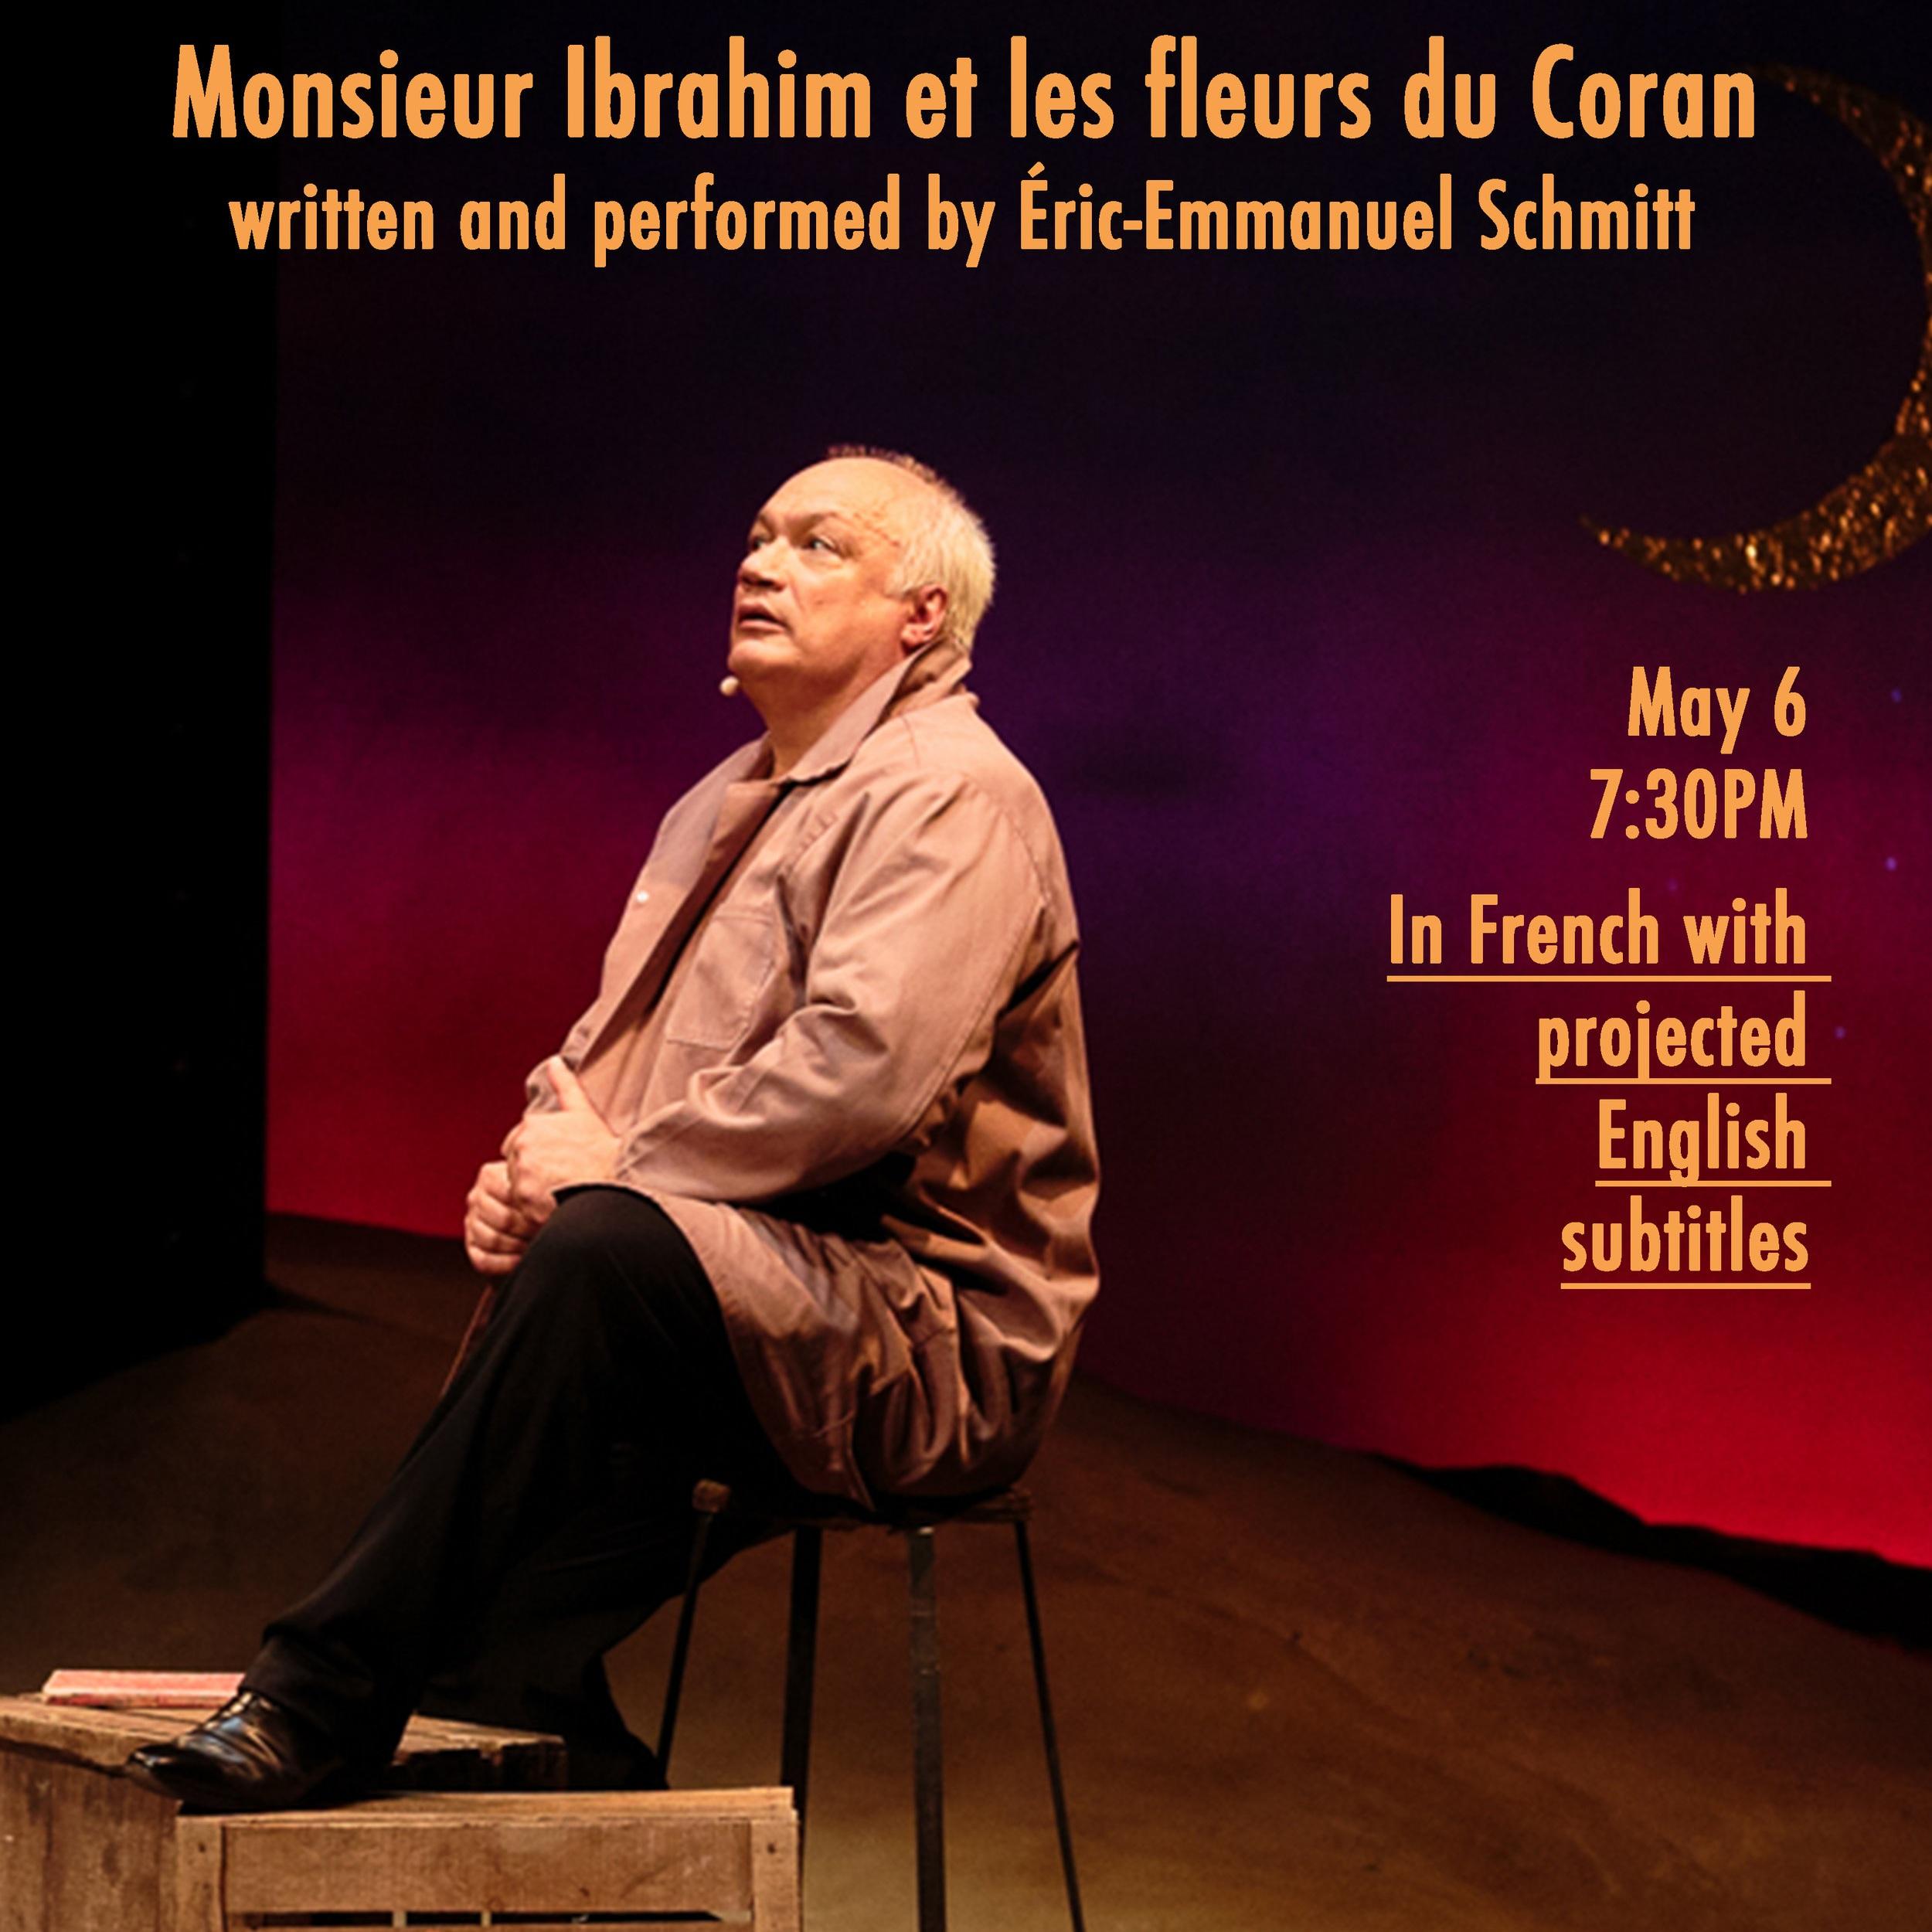 Monsieur Ibrahim et les fleurs du Coran by Eric-Emmanuel Schmitt